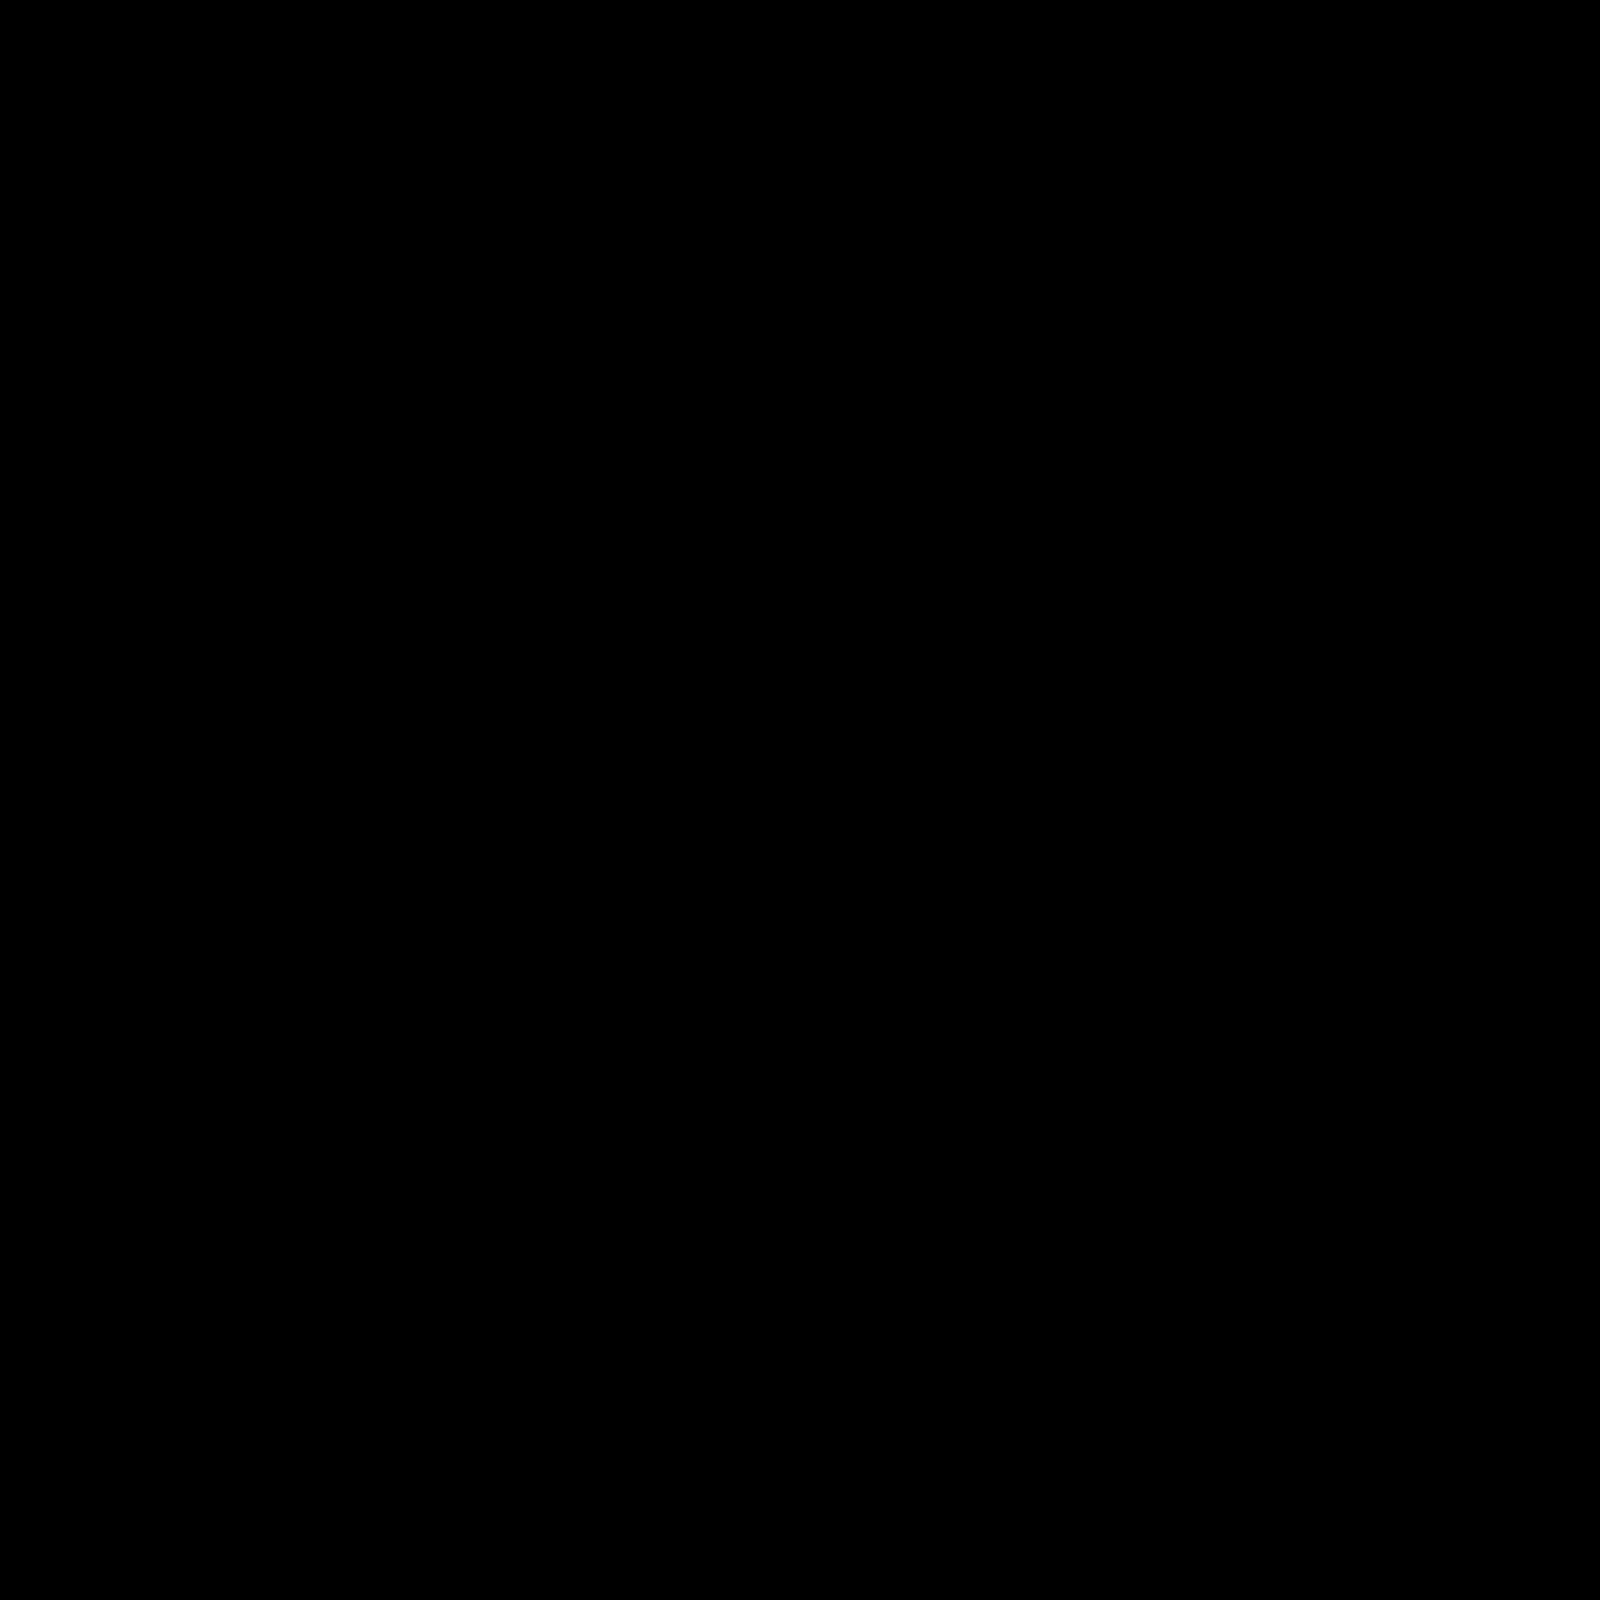 smok icon